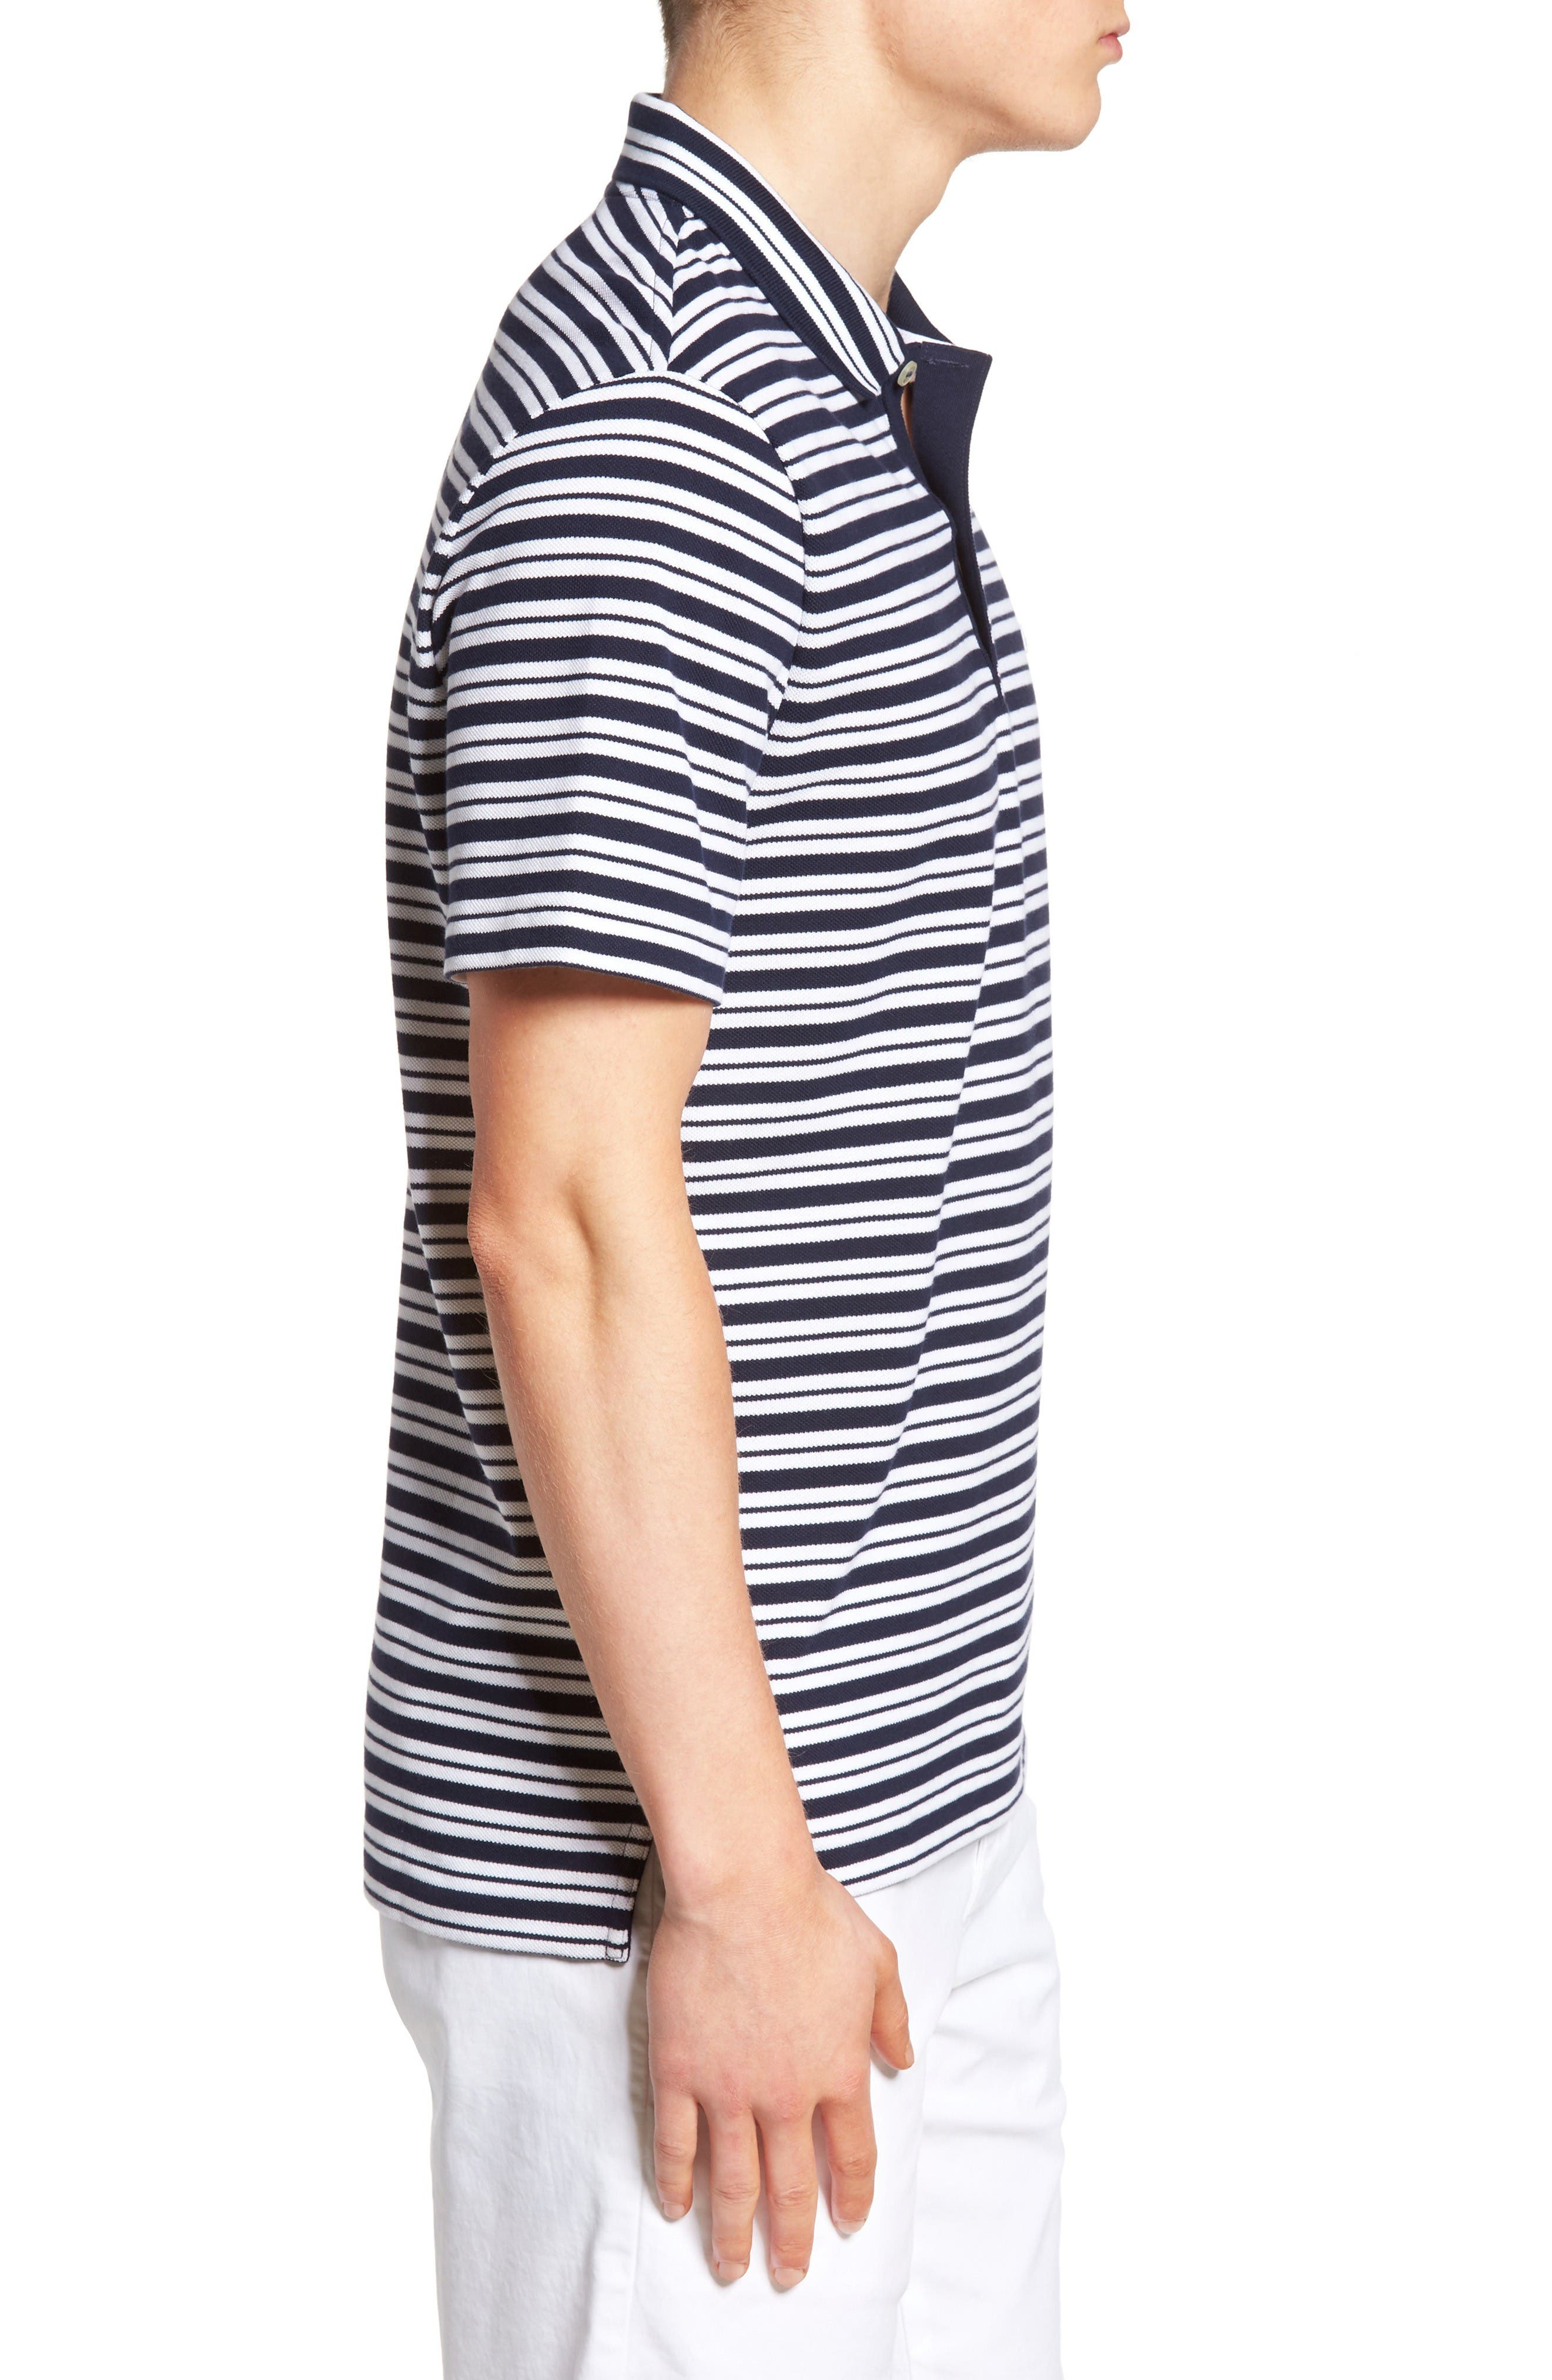 Alternate Image 3  - Lacoste Striped Polo